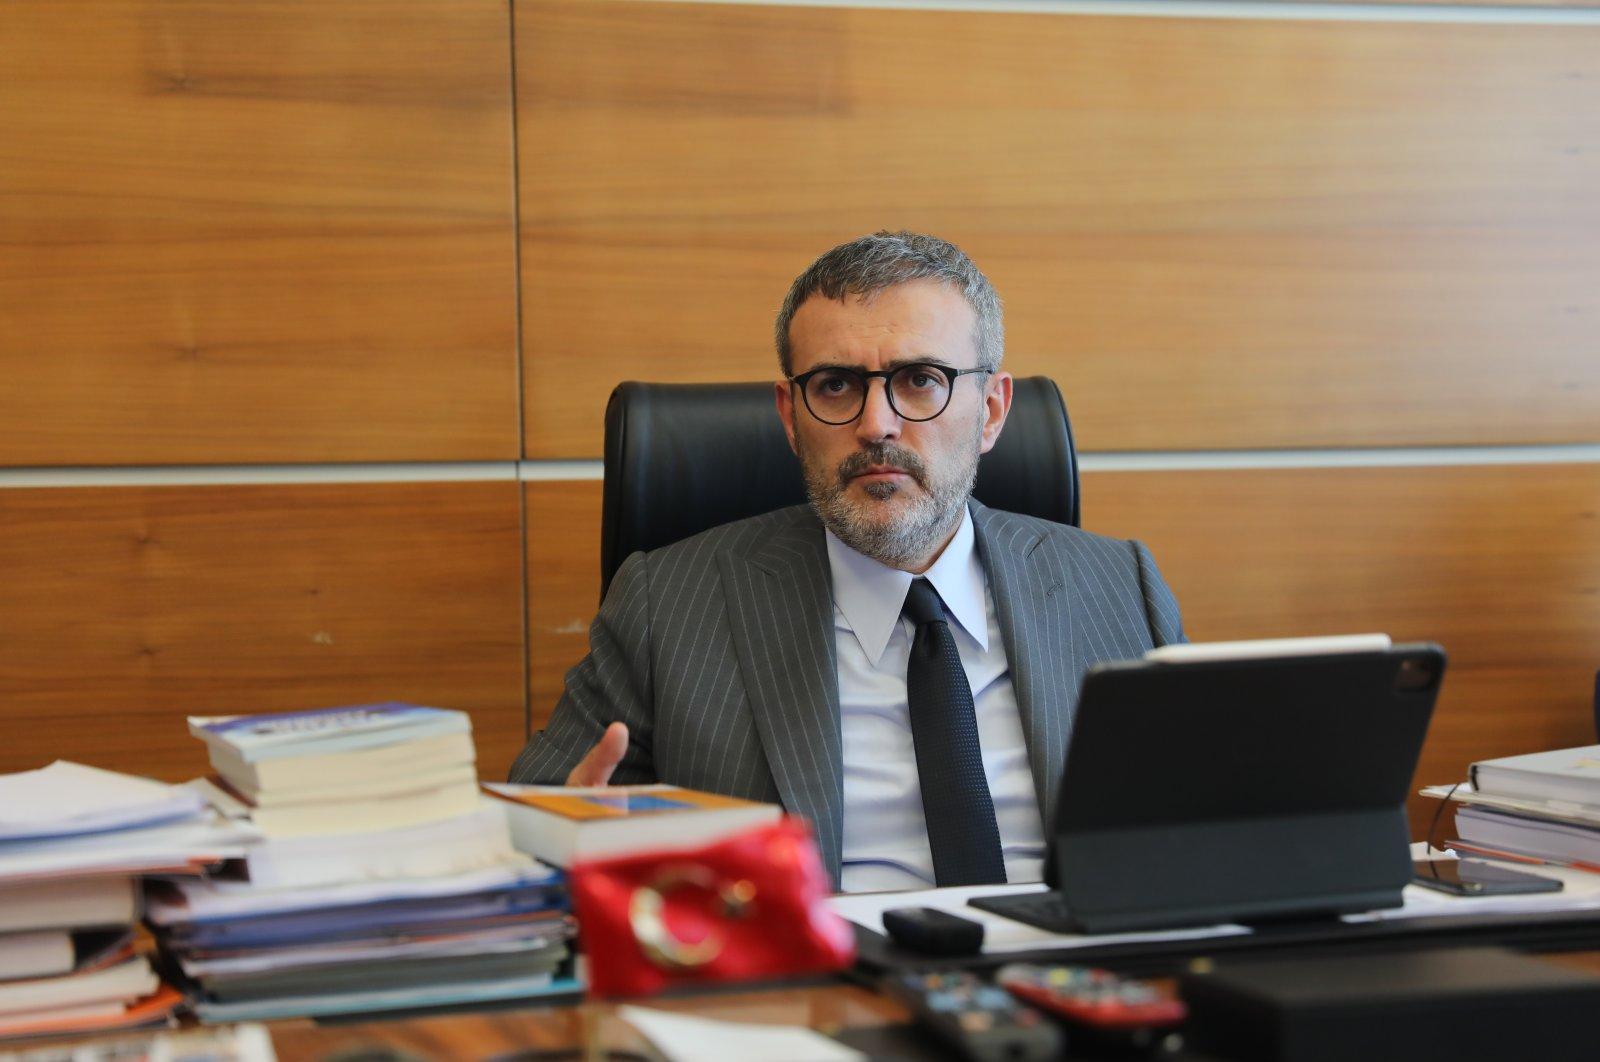 Justice and Development Party (AK Party) Deputy Chair Mahir Ünal speaks to Anadolu Agency (AA) in the capital Ankara, Turkey, March 19, 2021. (AA Photo)